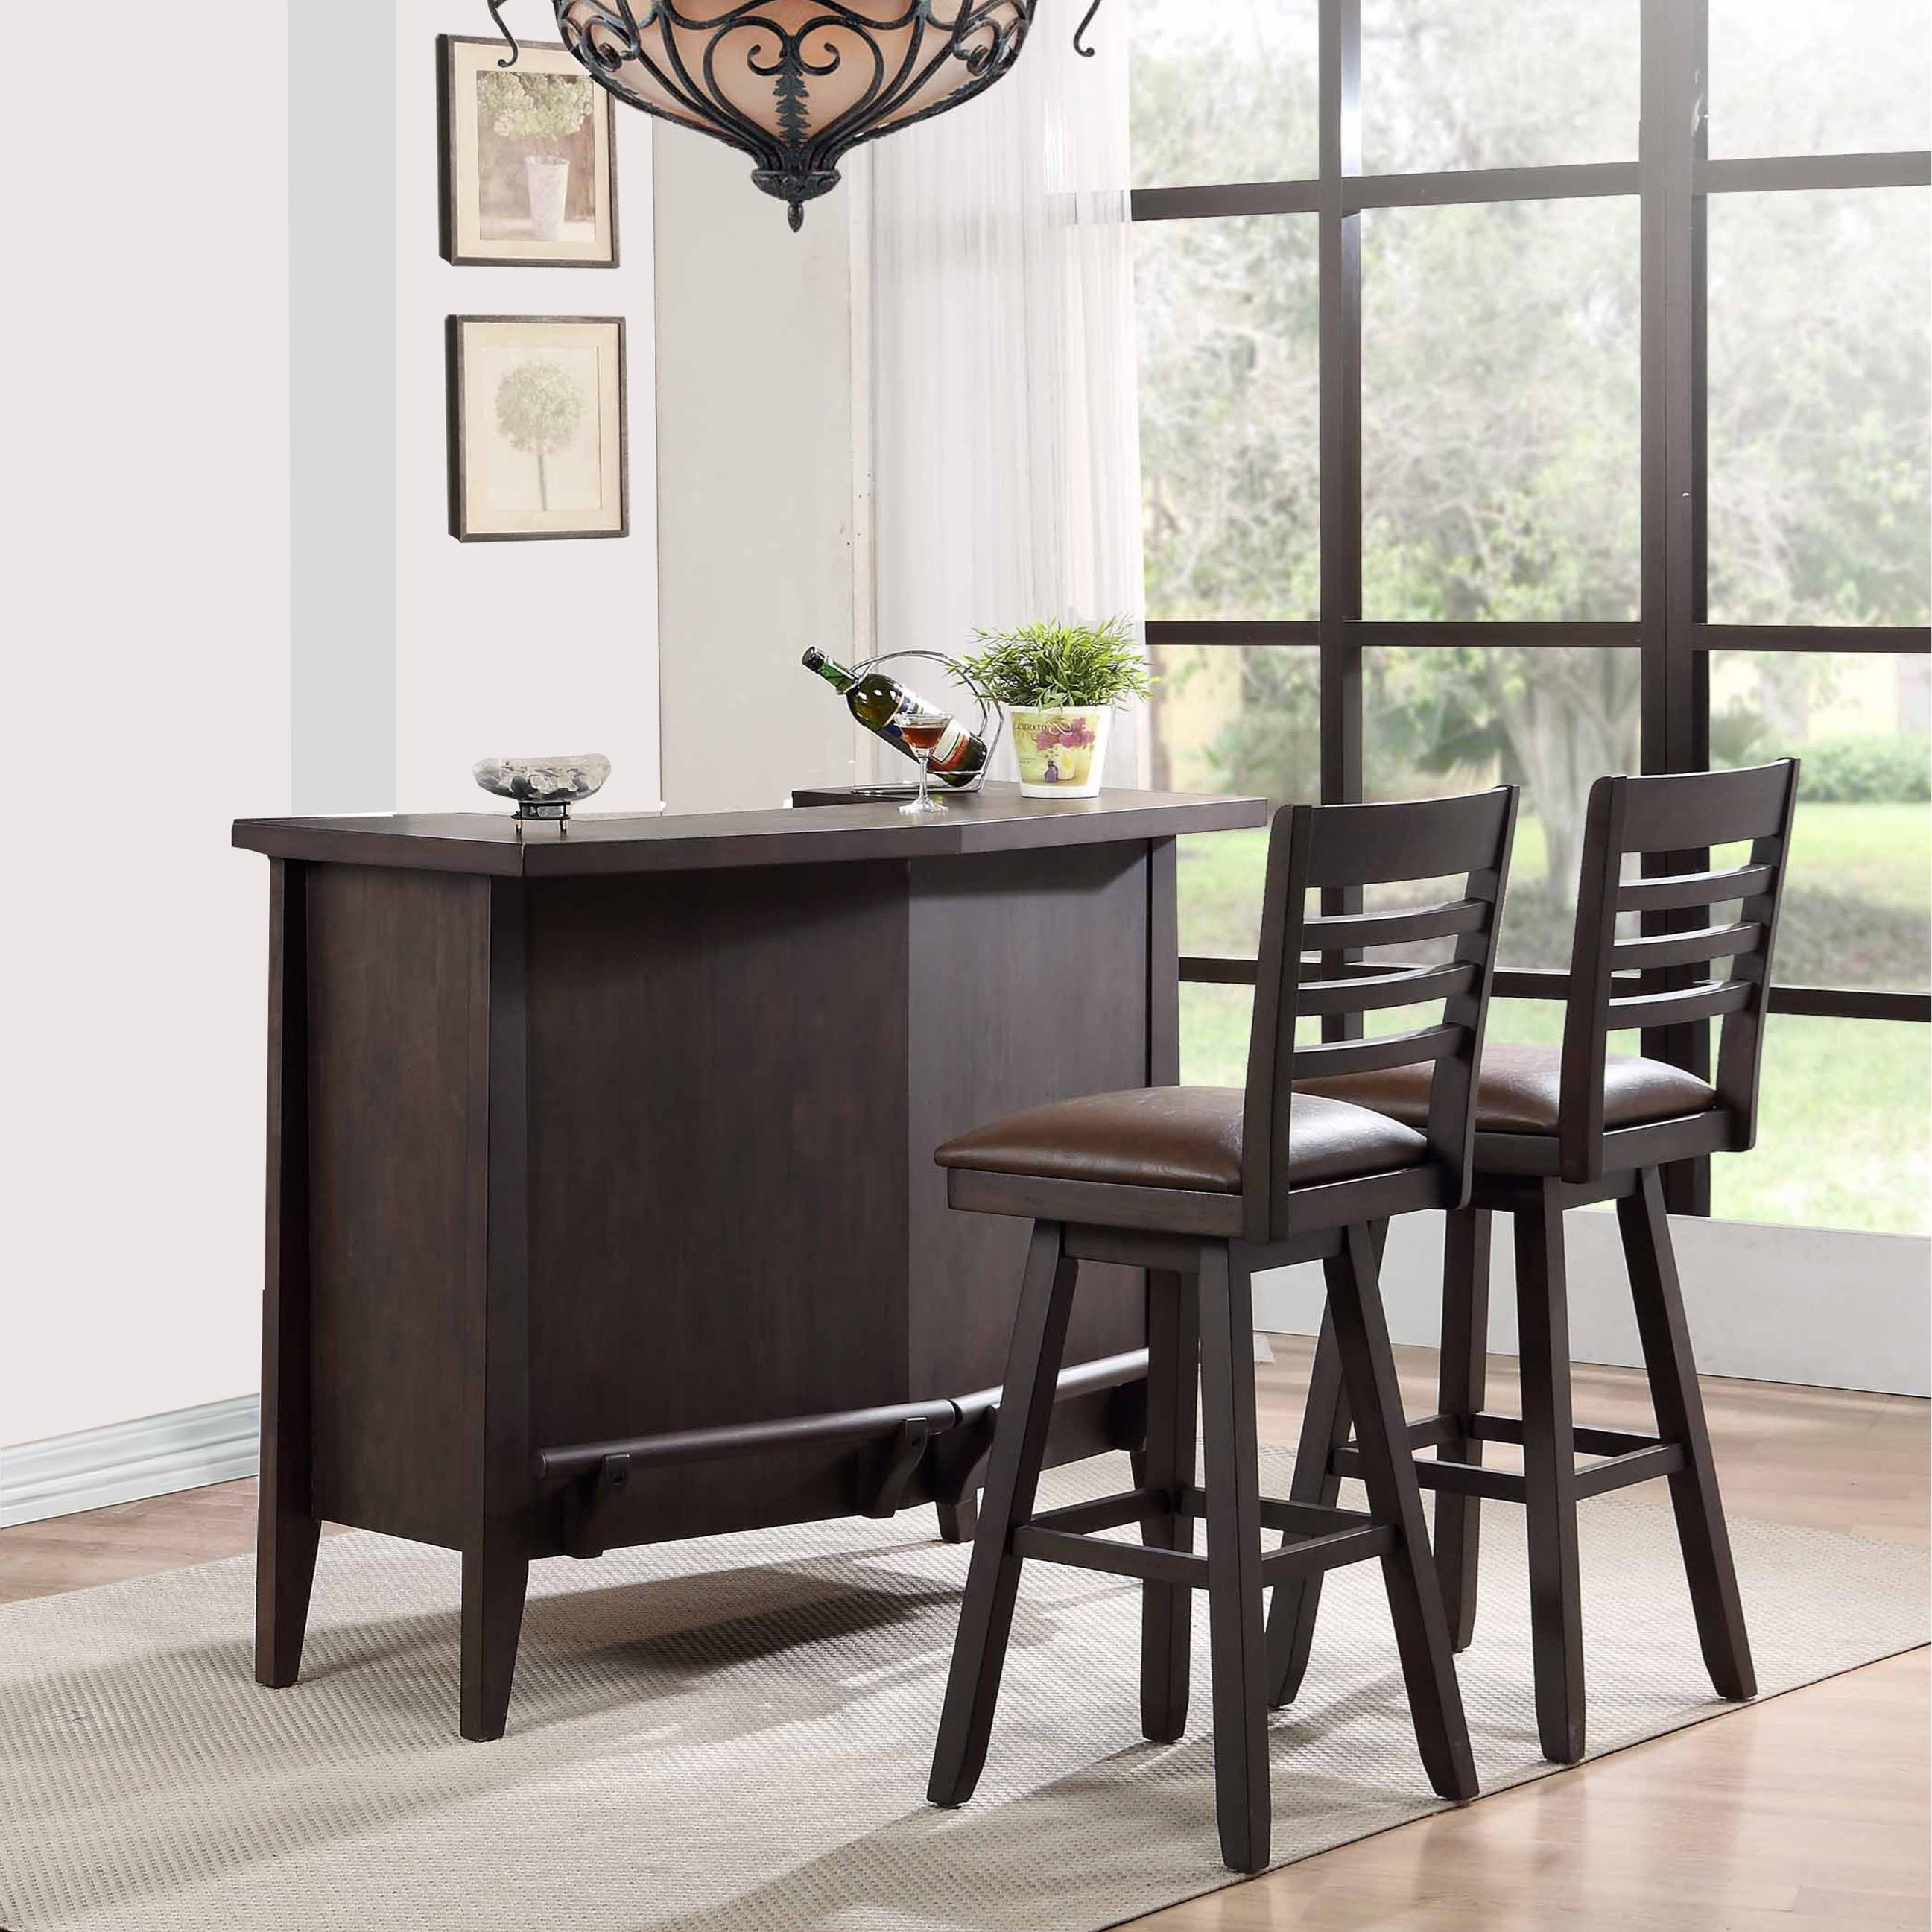 E.C.I. Furniture Lexington Bar and Stool Set - Item Number: 3095-50-B+T+2x3095-50-BS